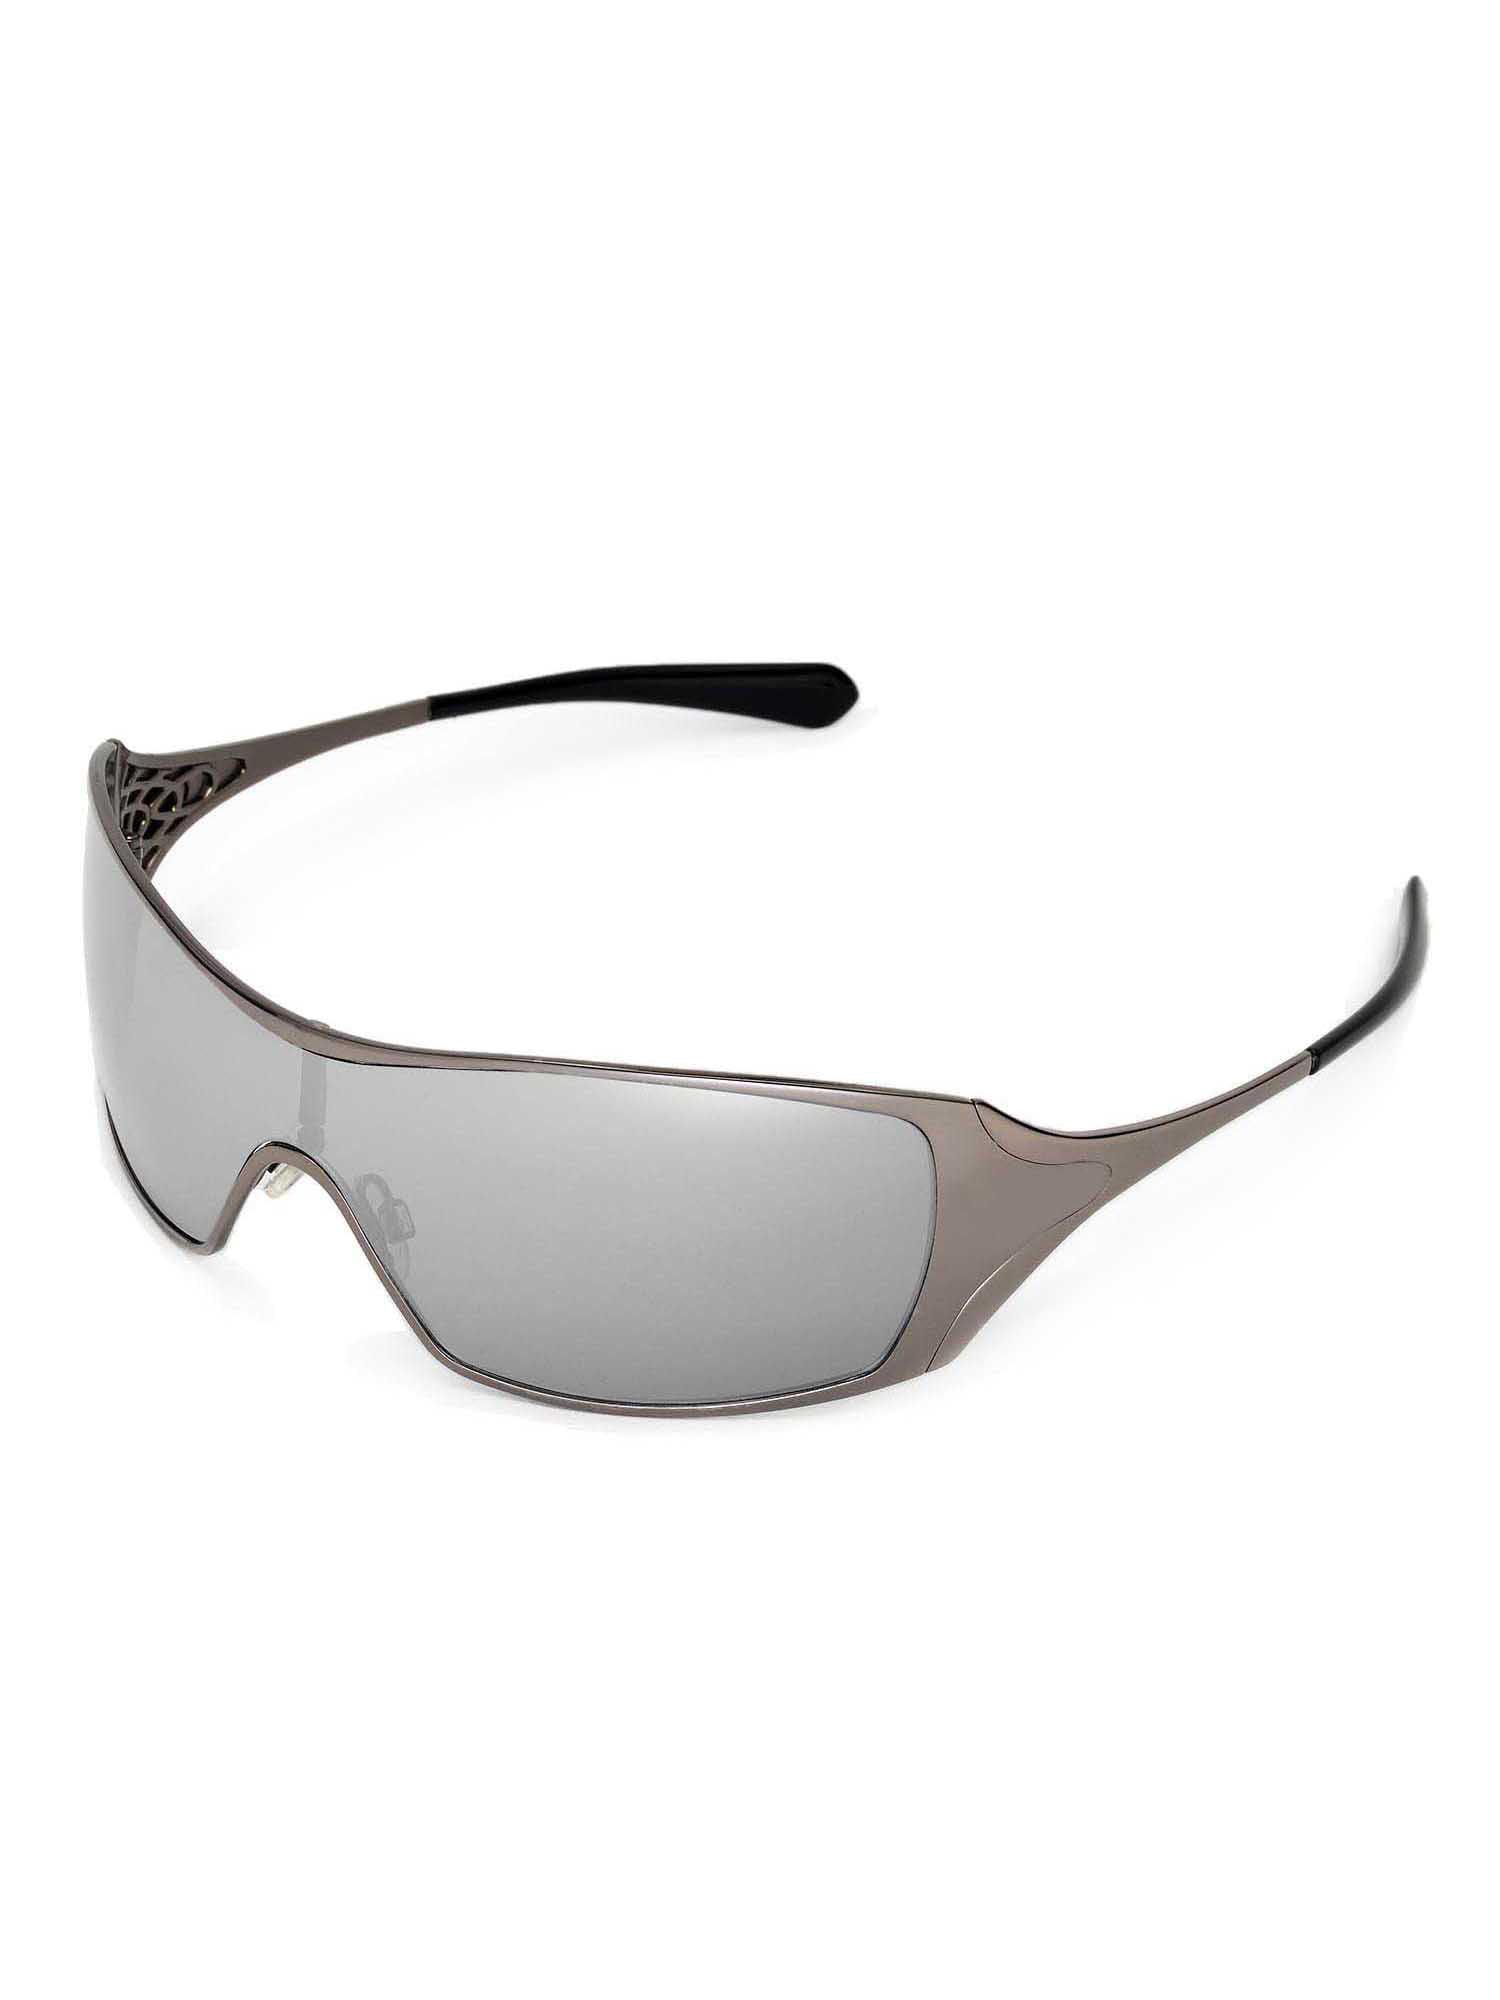 e875462fb293 Walleva - Walleva 24K Gold Polarized Replacement Lenses for Oakley Dart  Sunglasses - Walmart.com